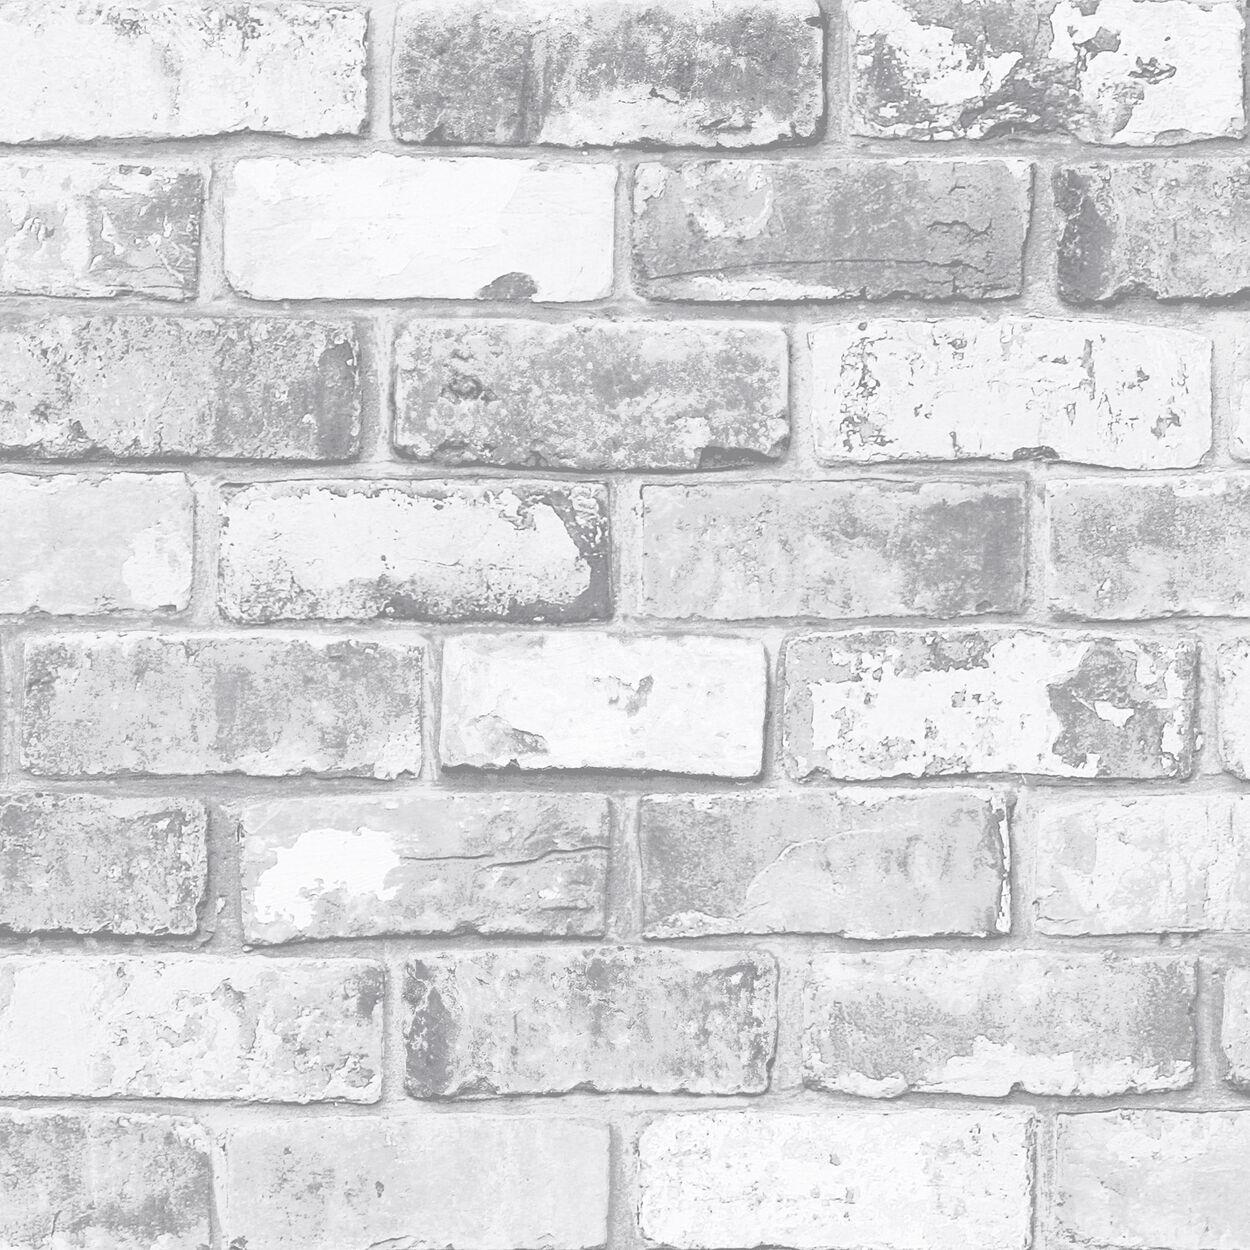 Brick Wallpaper - Double Roll | Bouclair.com